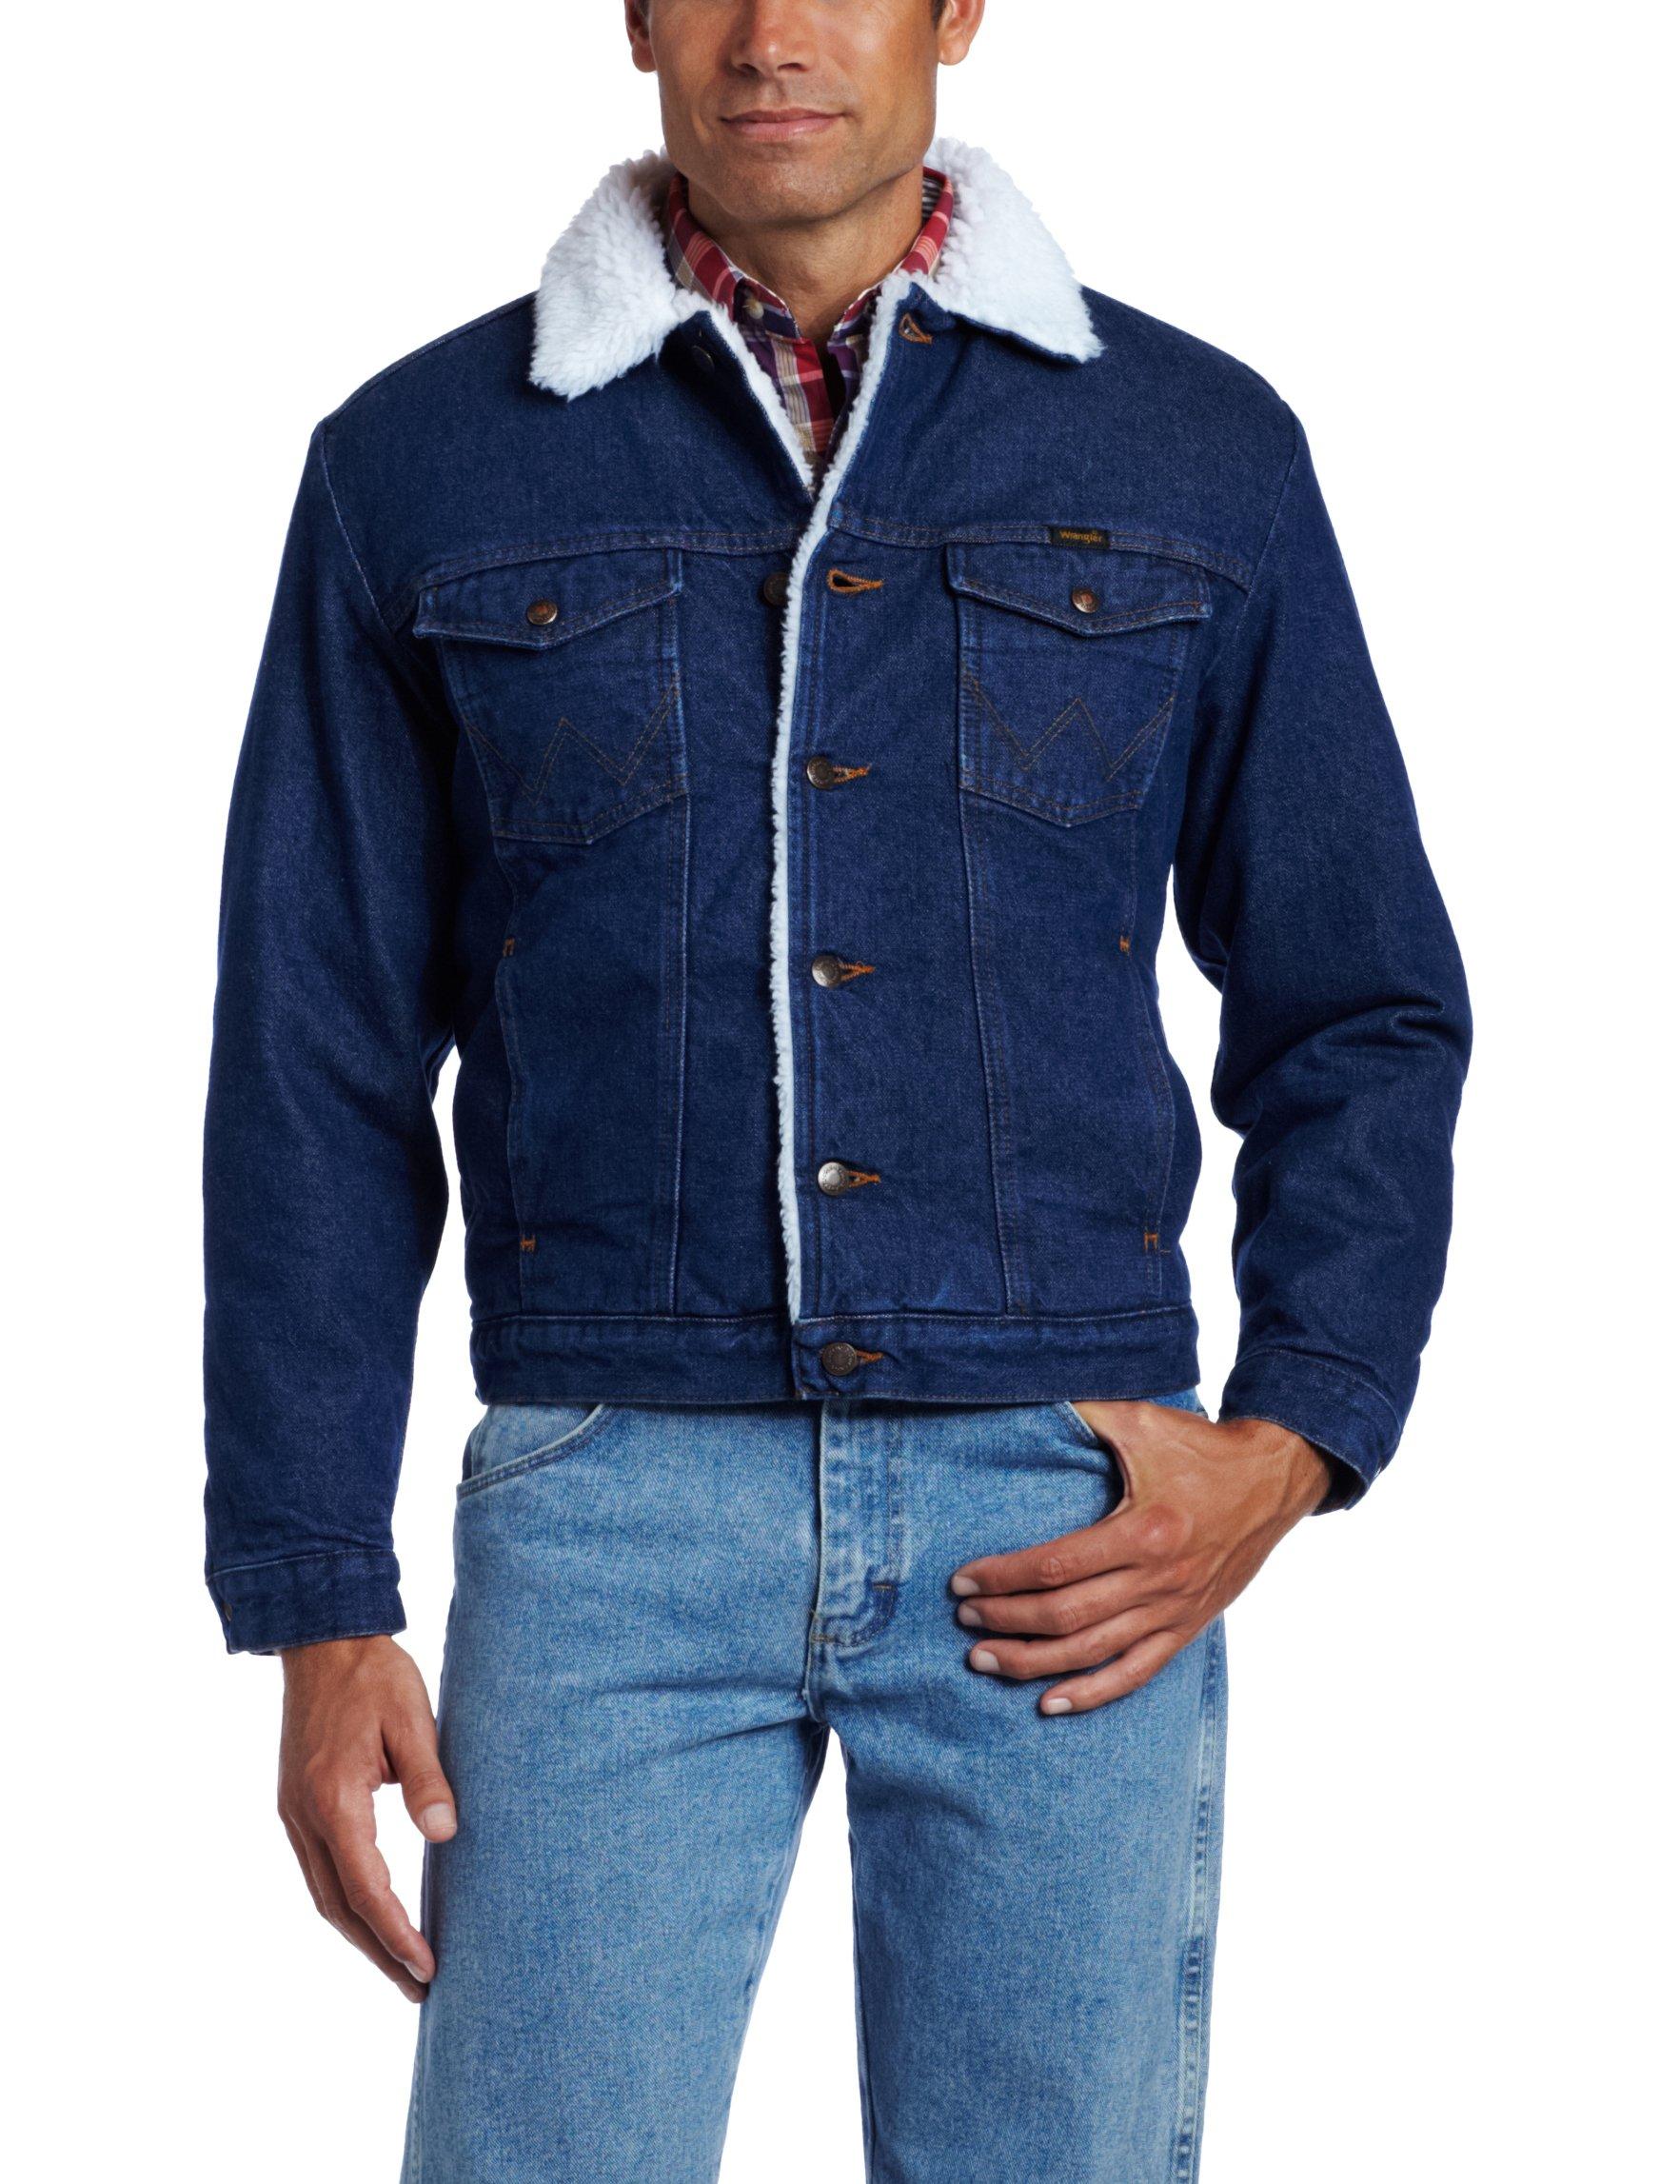 Wrangler Men's Sherpa Lined Denim Jacket, Denim/Sherpa, X-Large by Wrangler